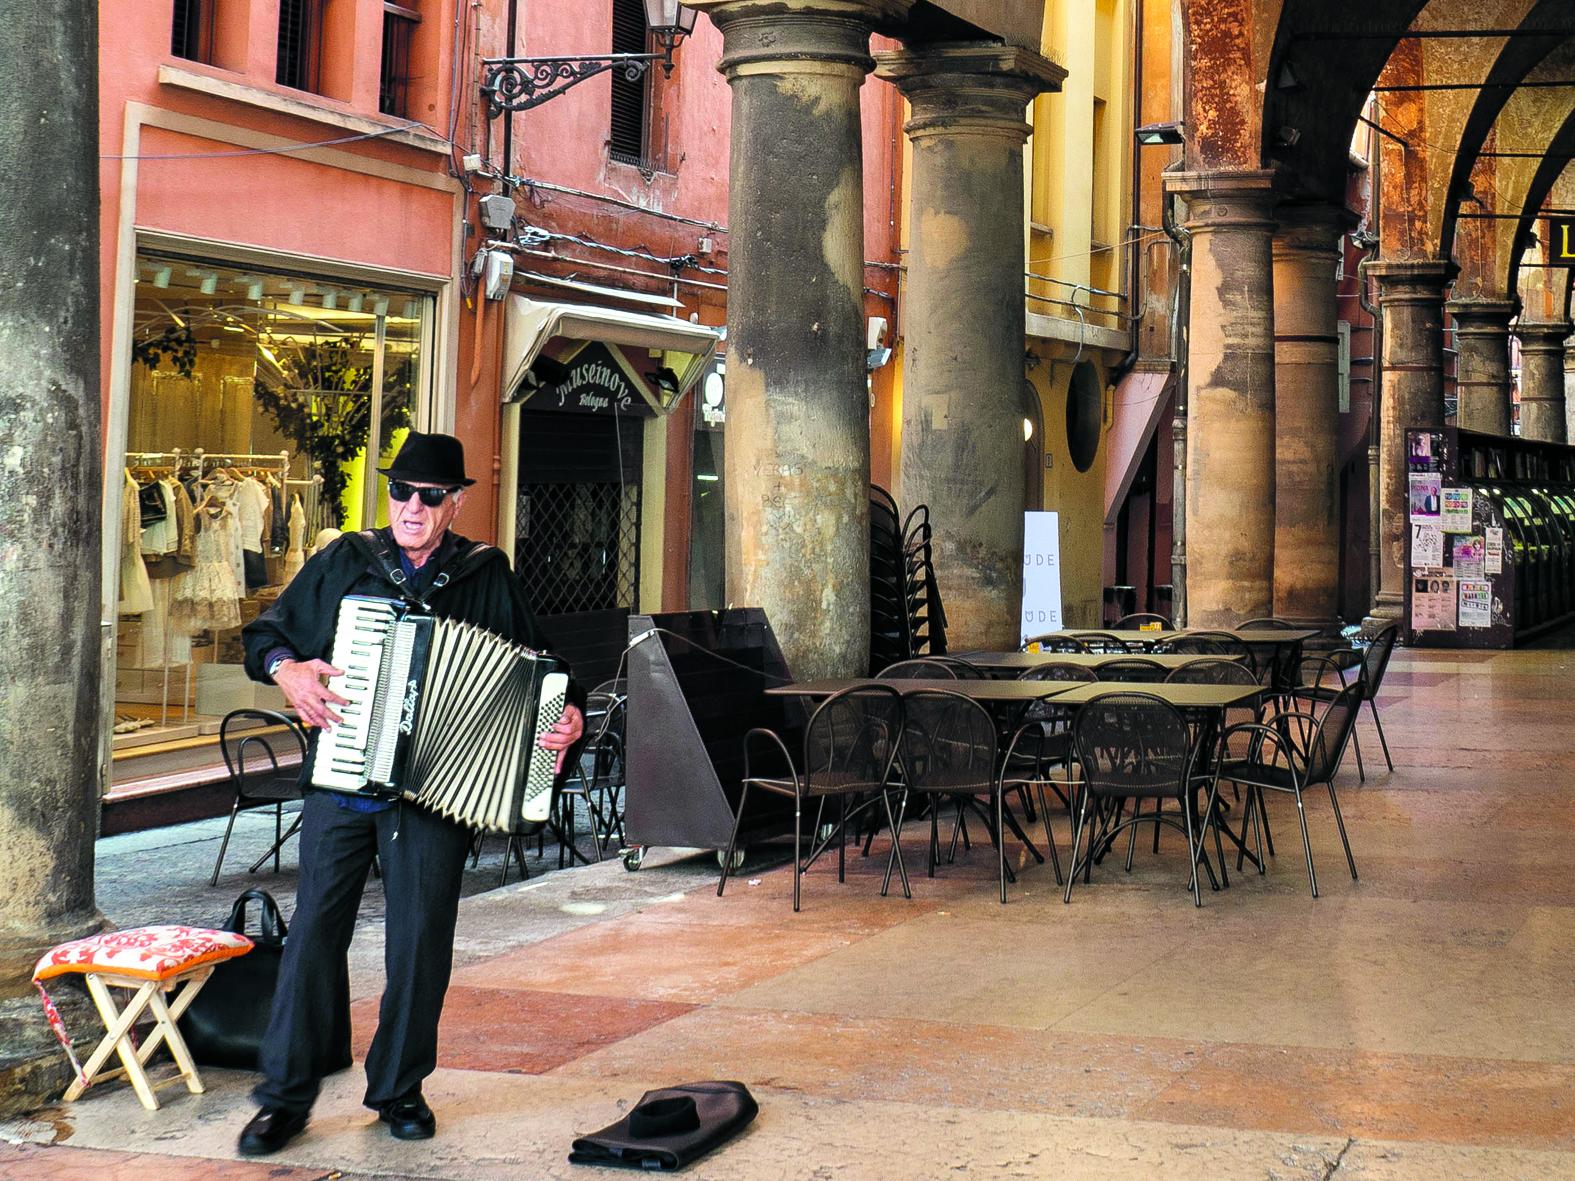 Een straatmuzikant in Bologna. (Foto: Nanne de Boer)